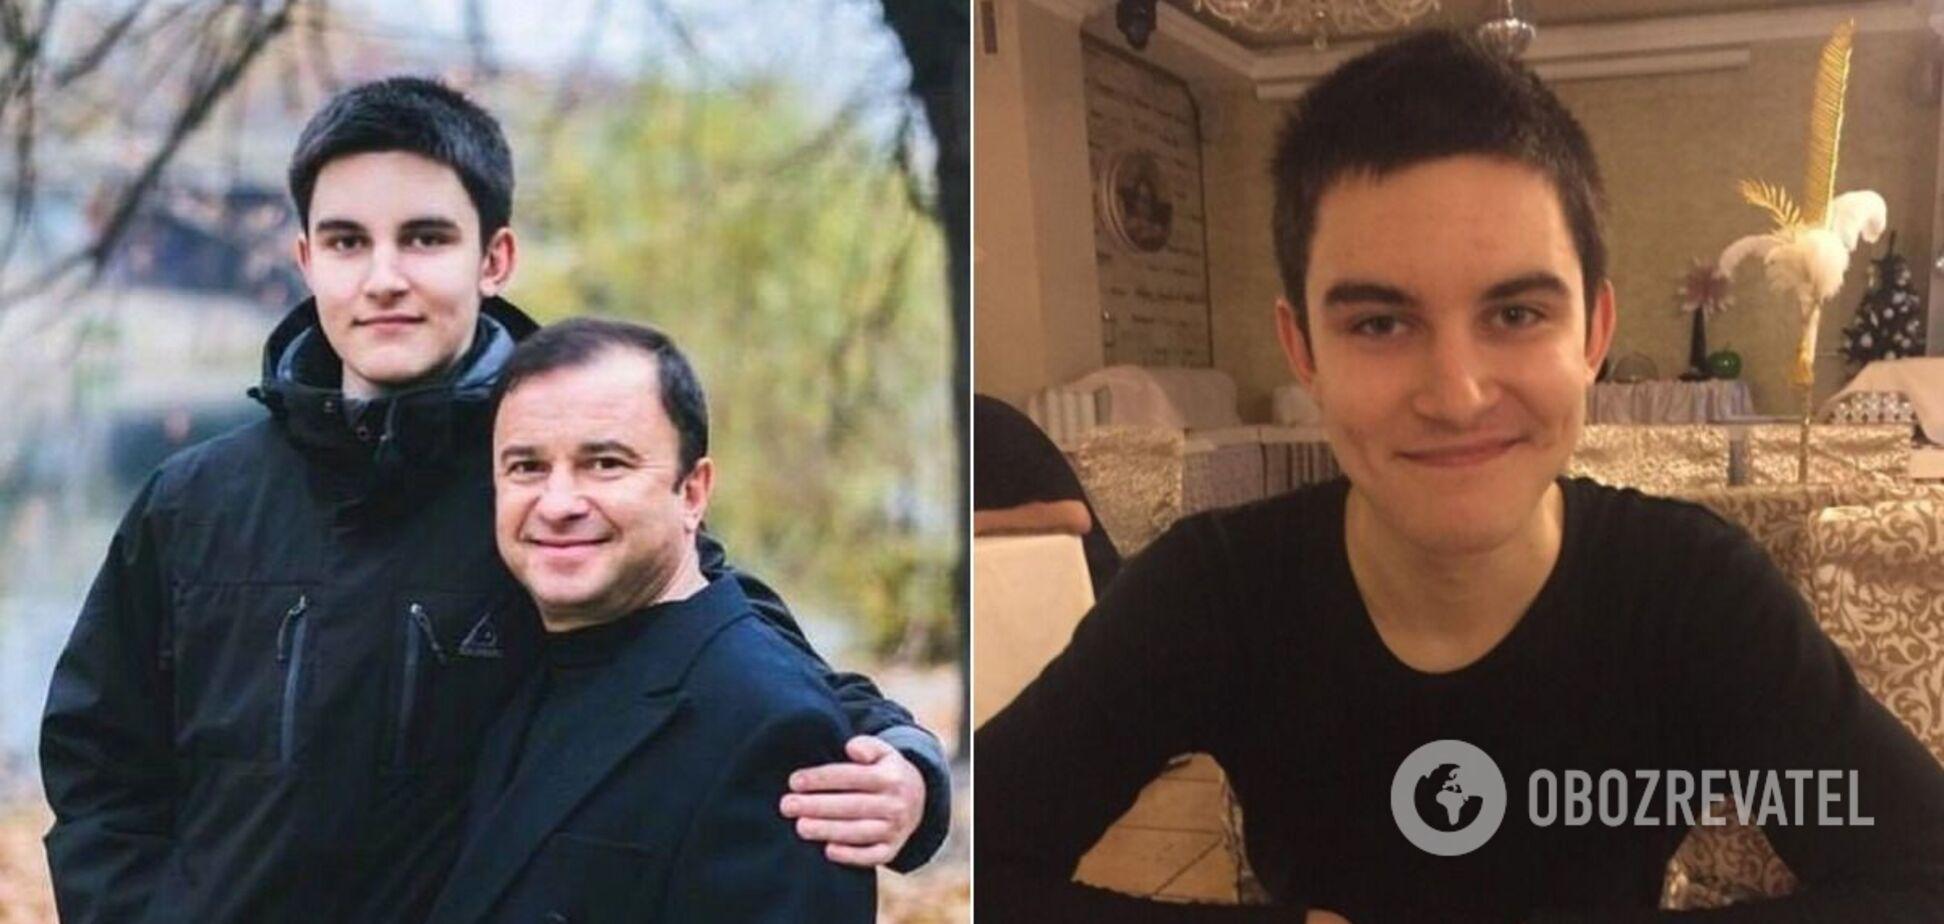 Умер 21-летний сын Виктора Павлика